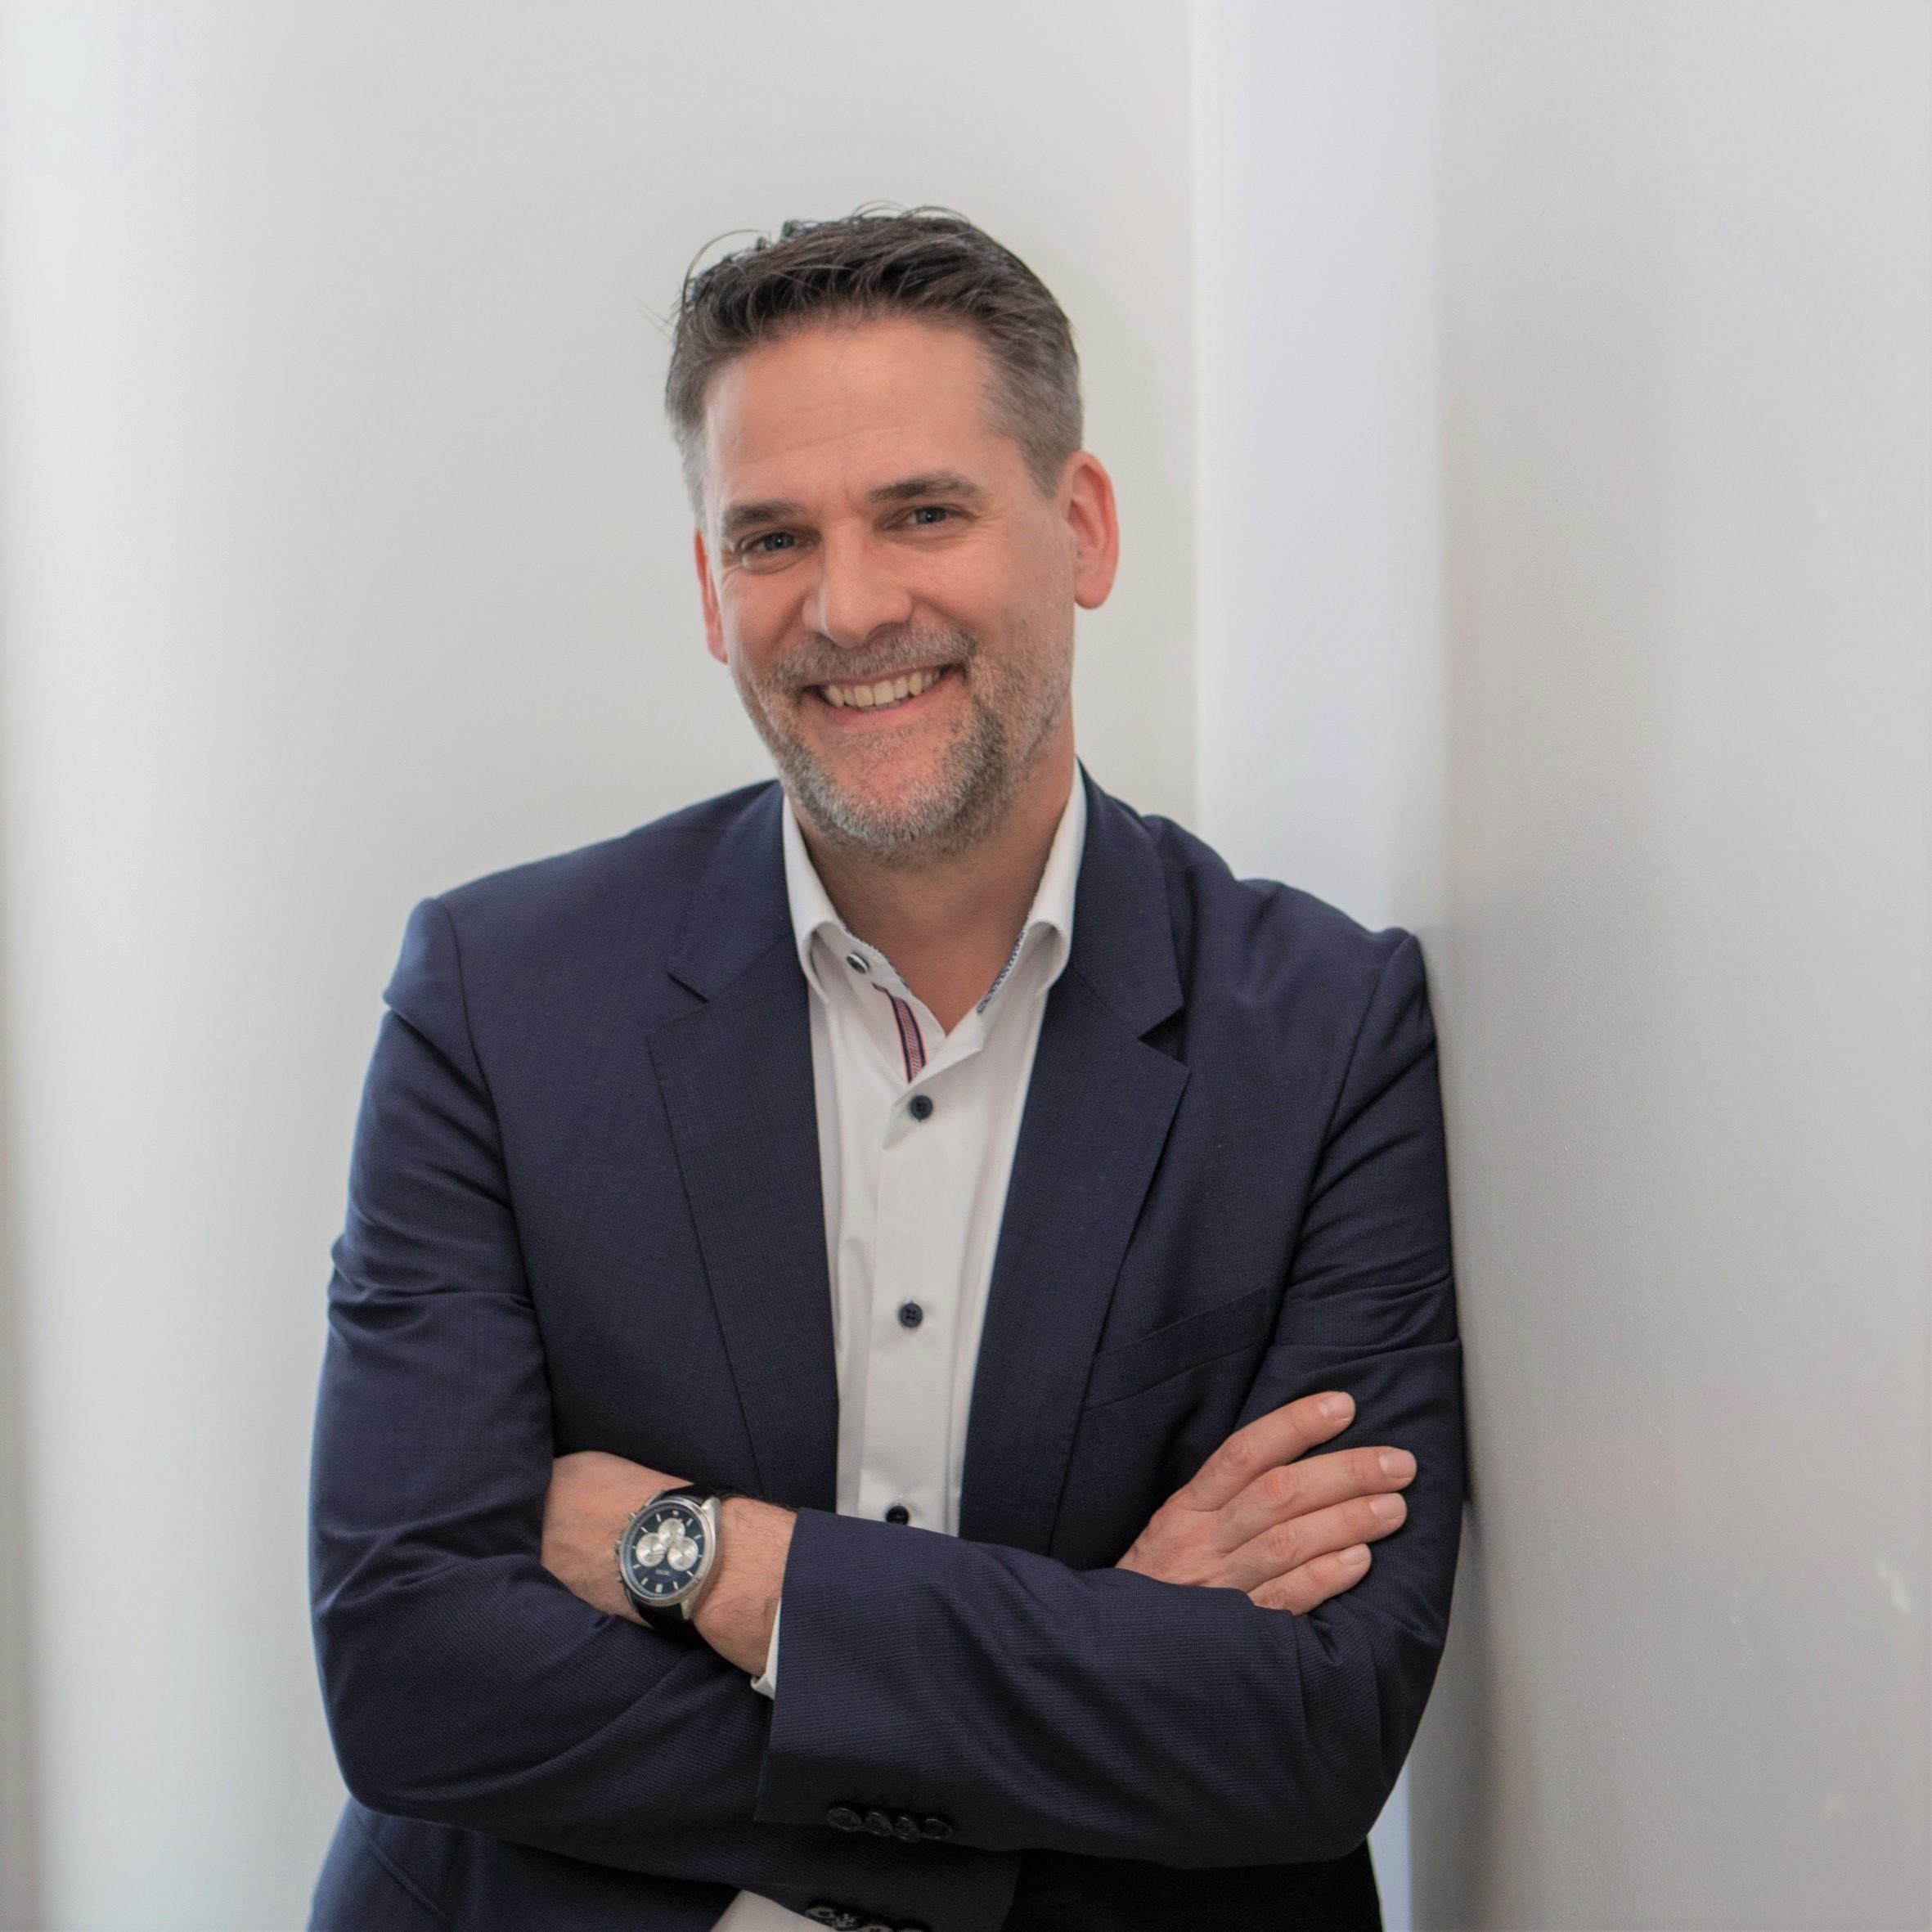 BCT-Geschäftsführer Dimitri Palmen